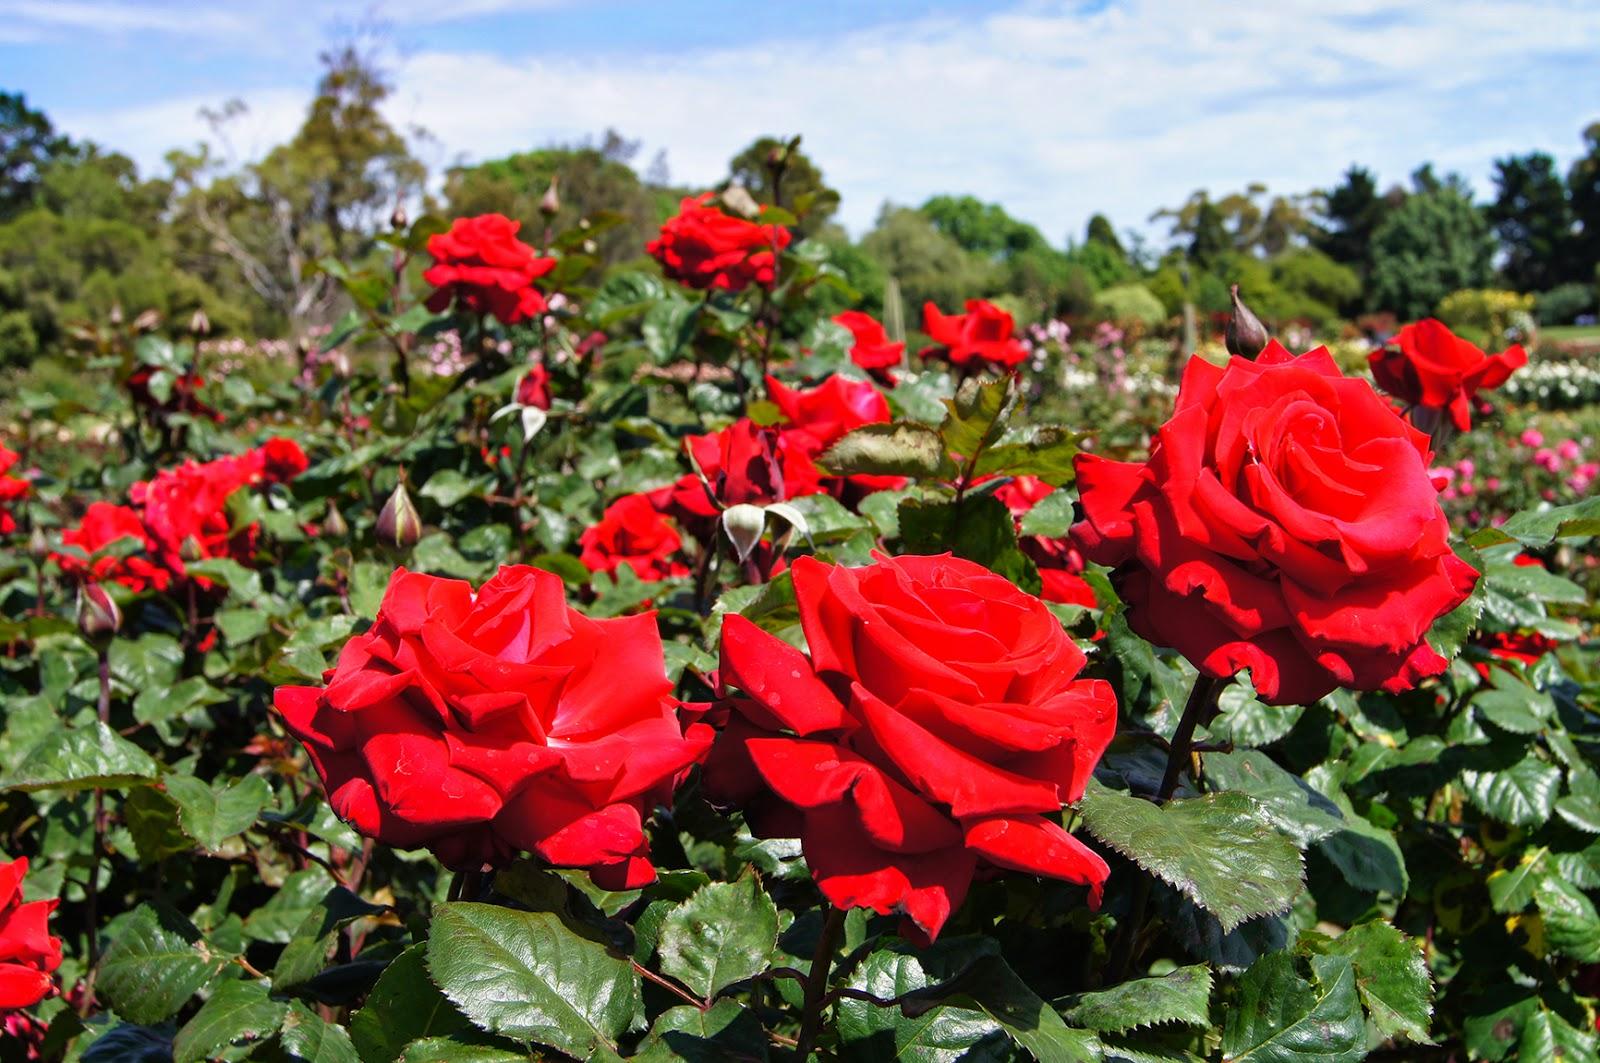 Nixpixmix Grande Amore Rose